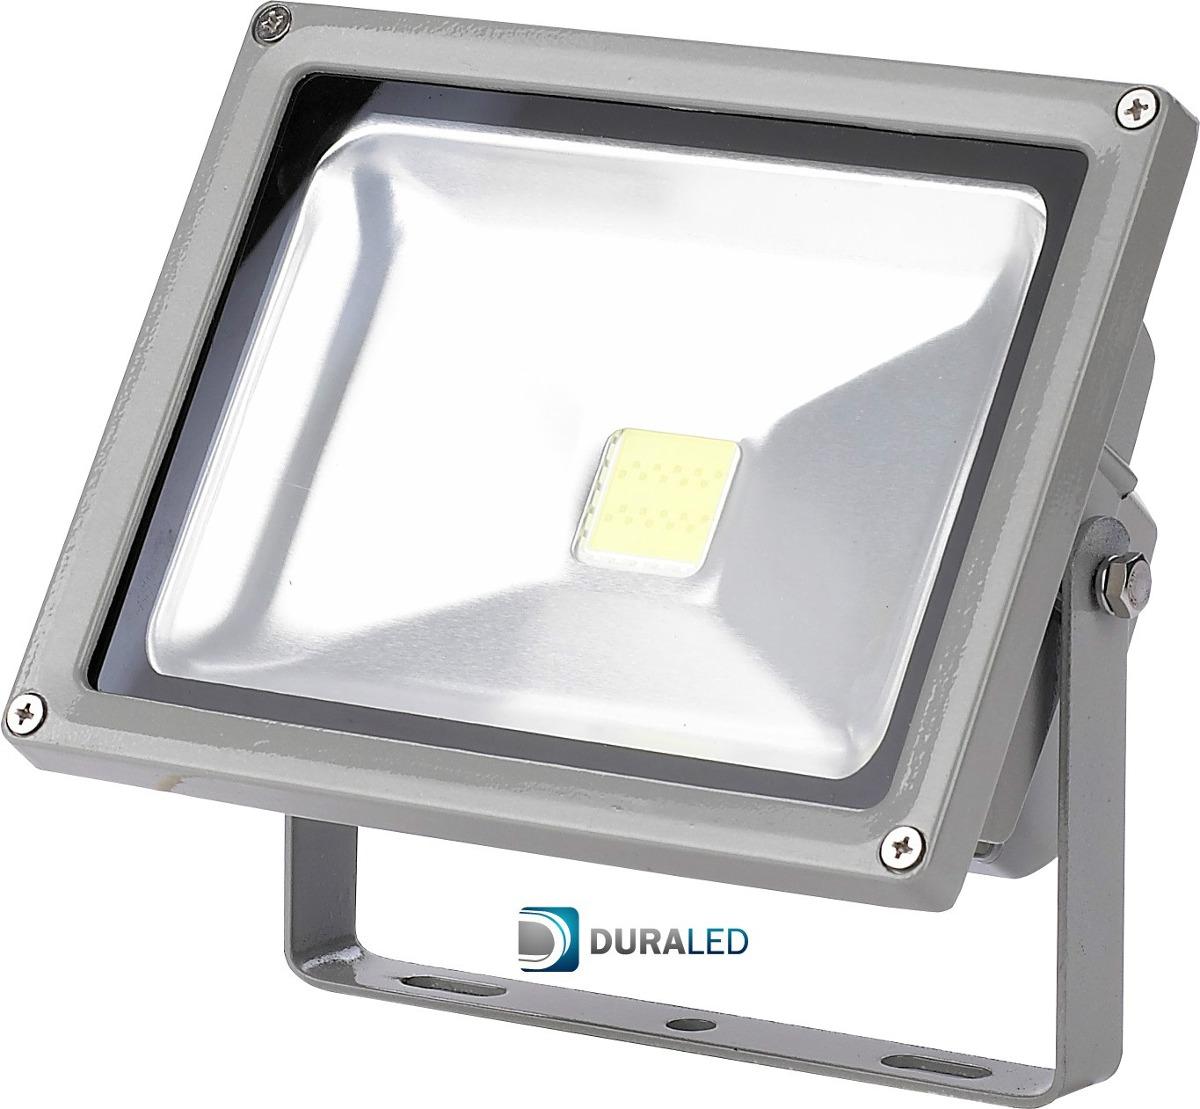 Reflector led para exterior 20w duraled 1 a o de garantia for Lamparas de led para exteriores